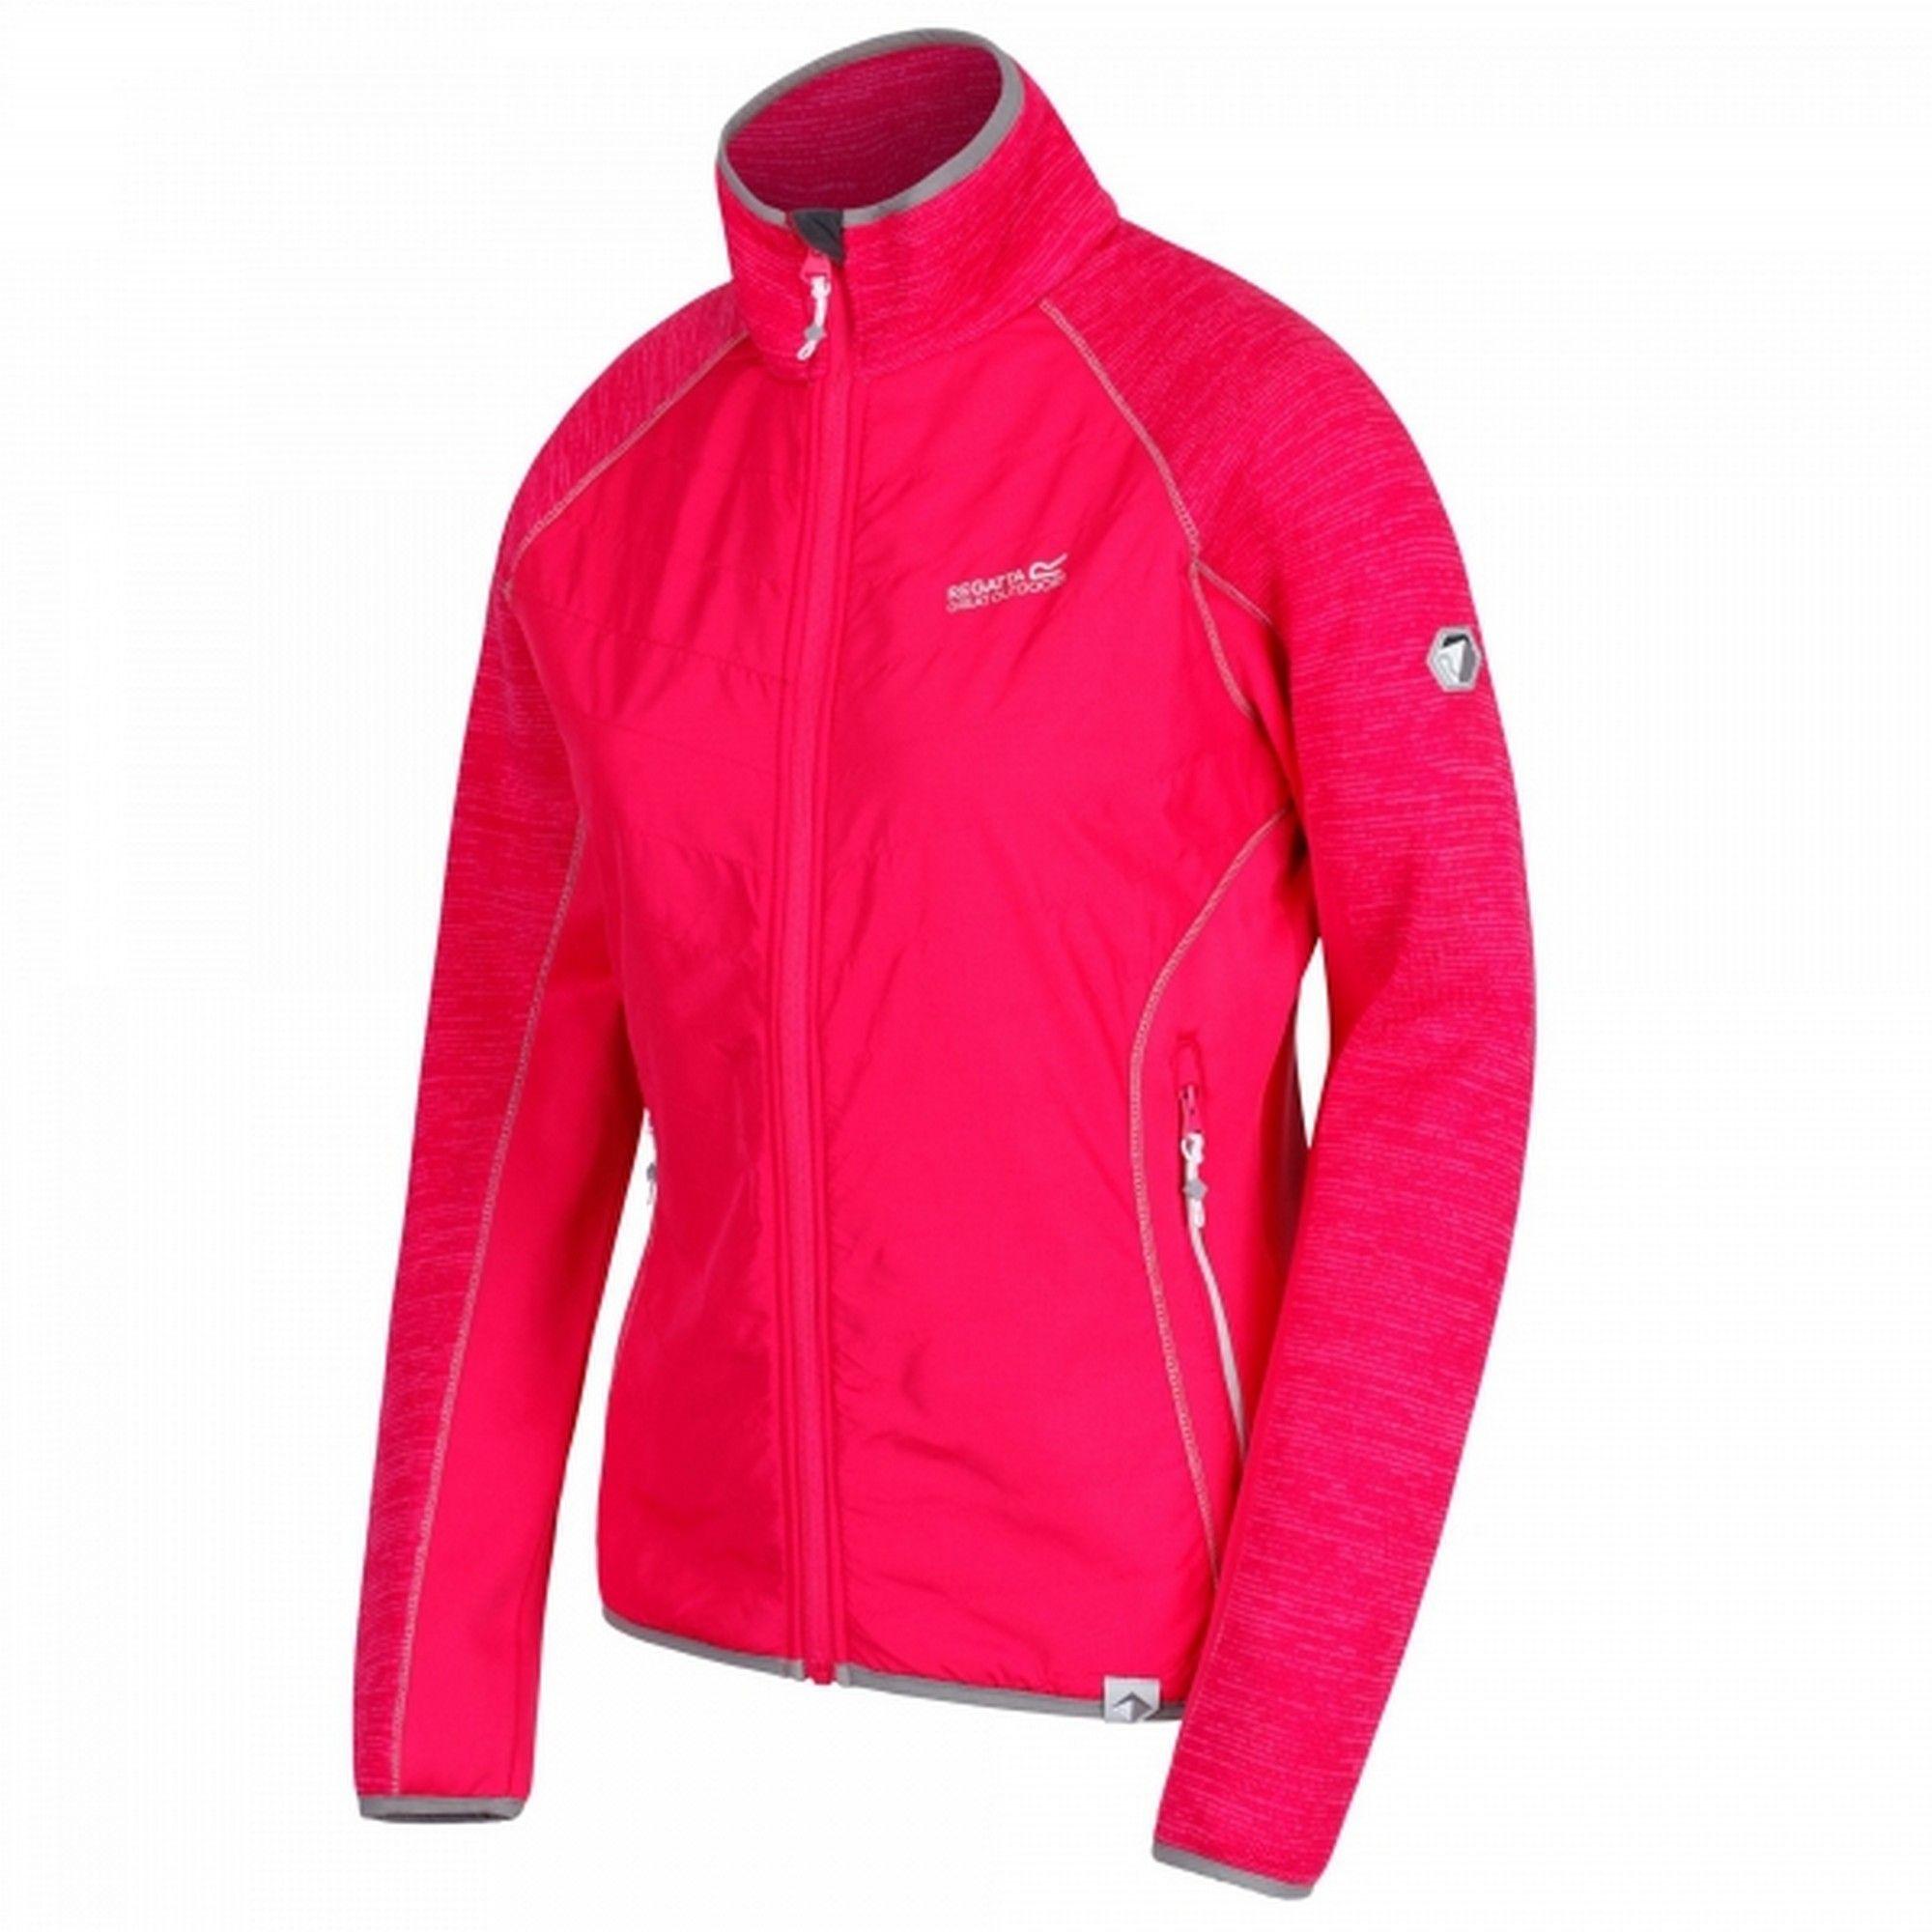 Regatta Womens/Ladies Robson Hybrid Jacket